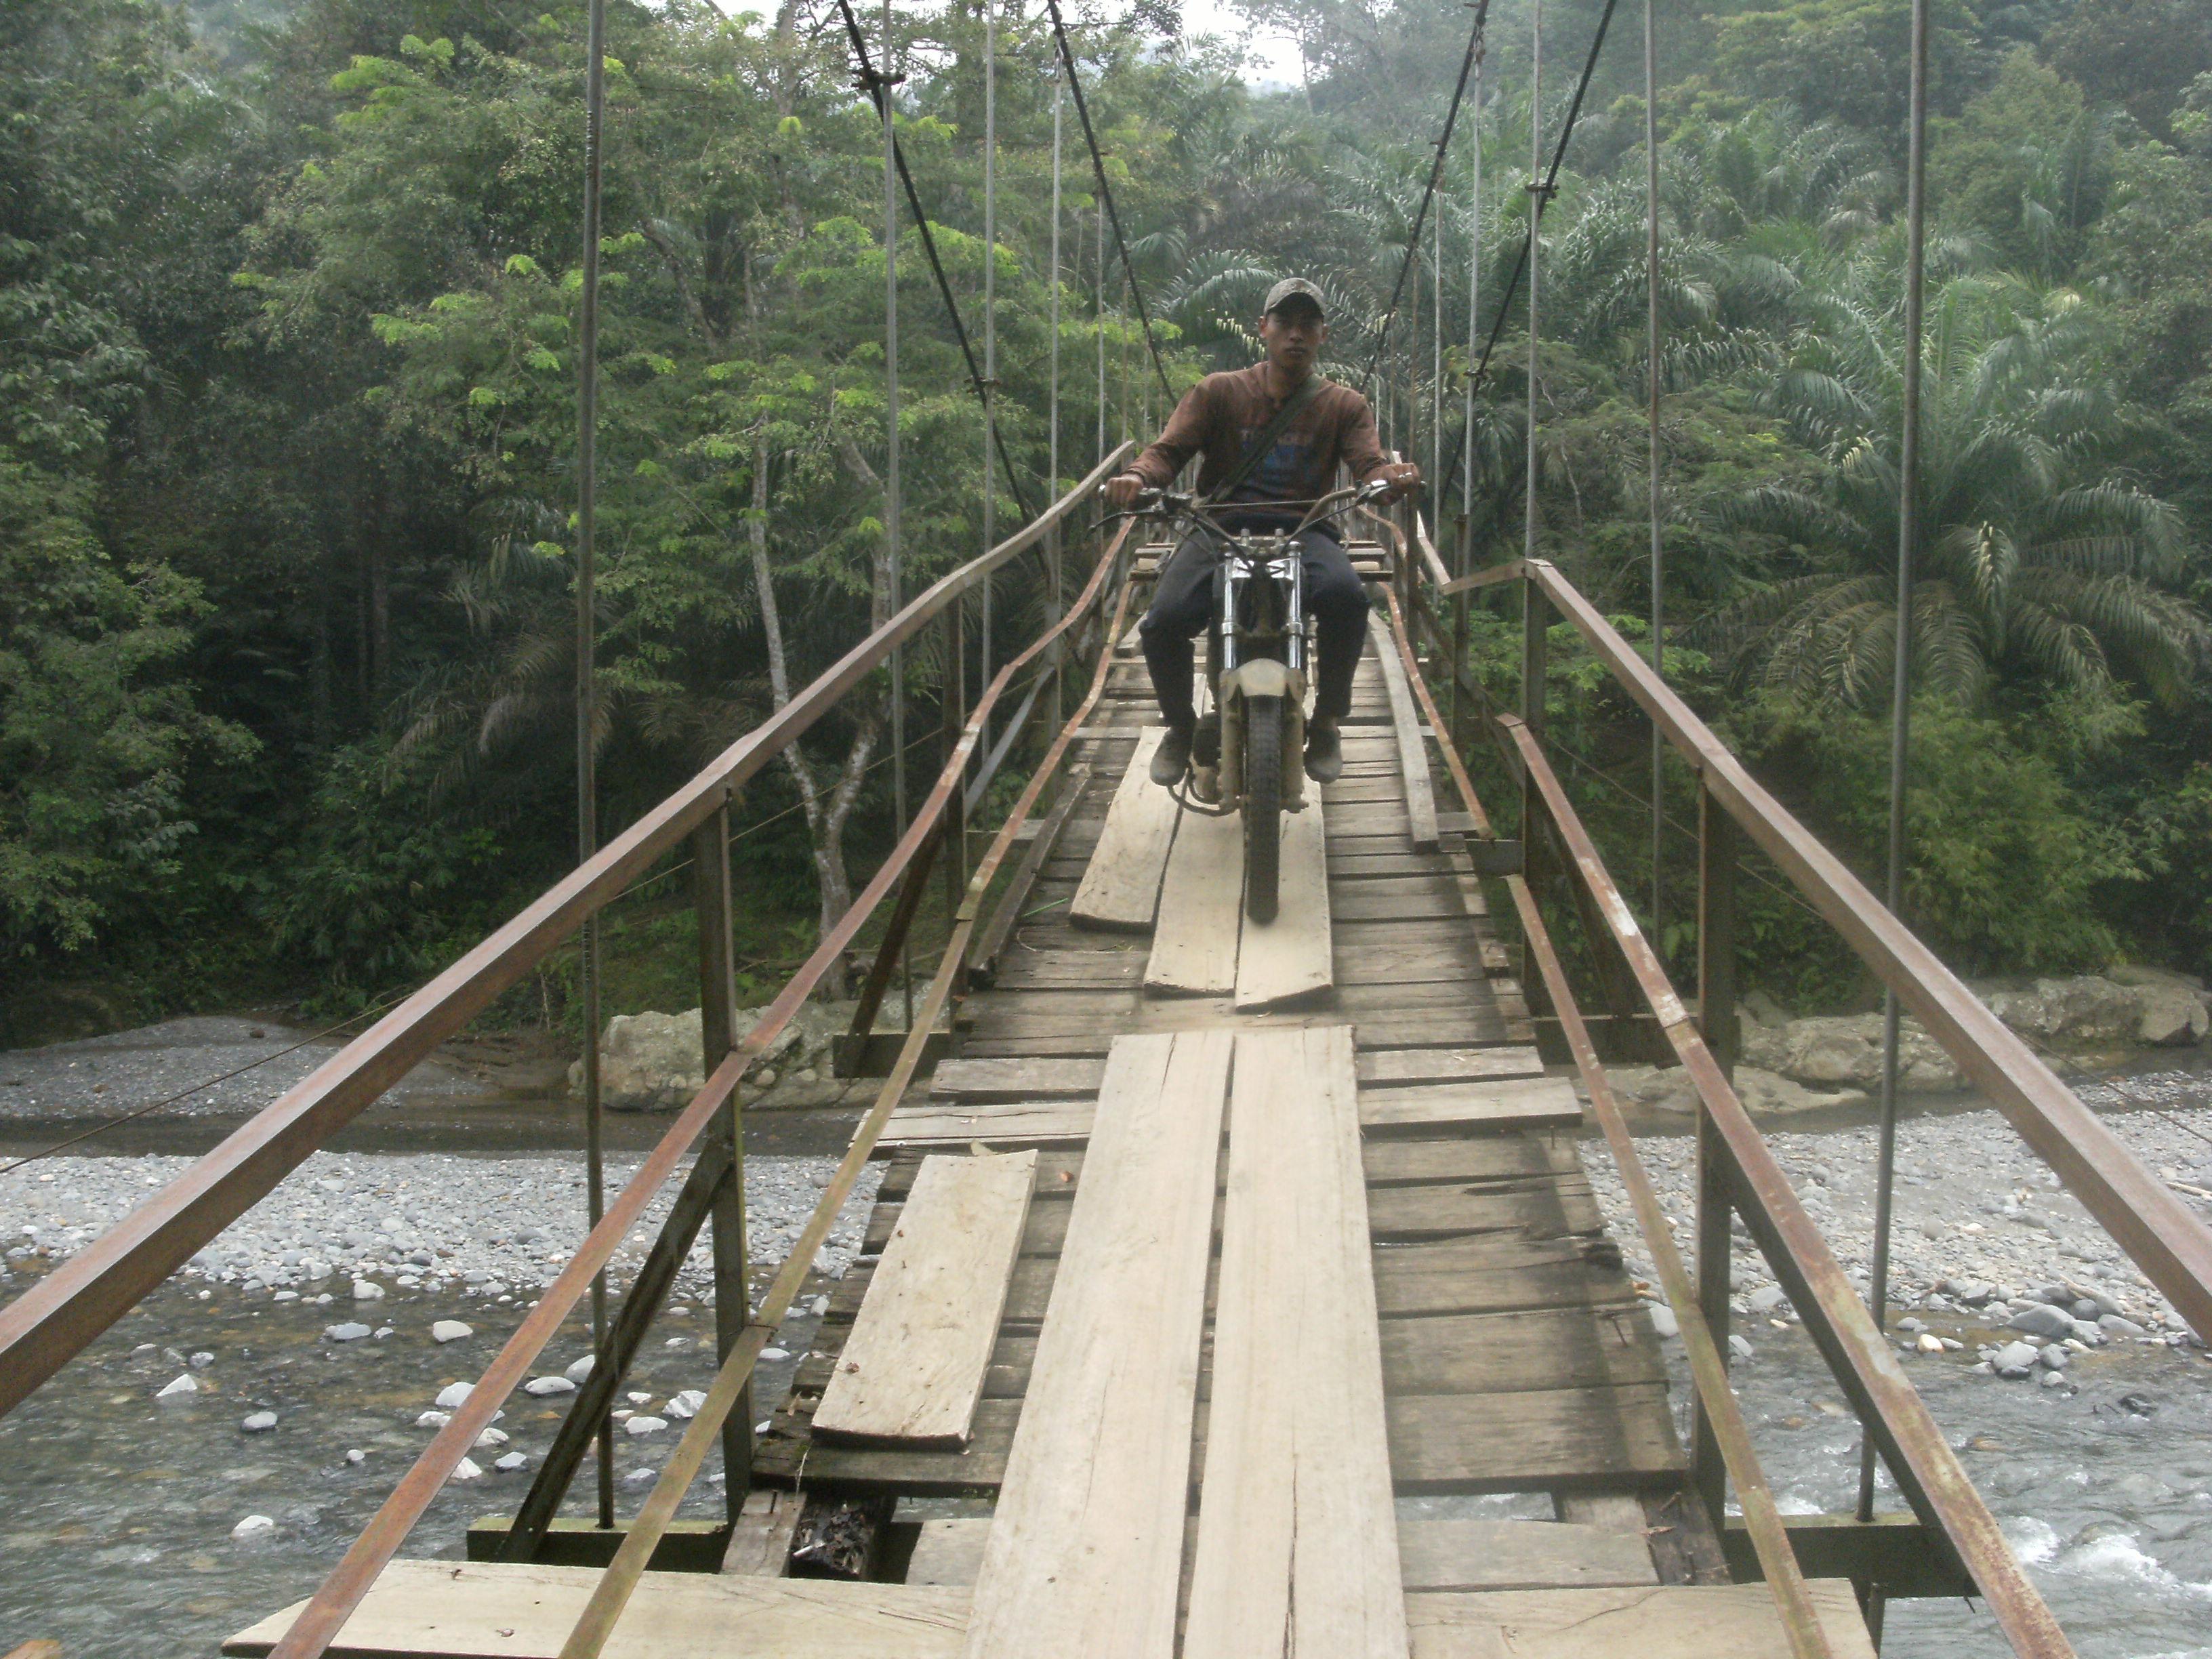 Jembatan Wisata Batu Katak Nyaris Putus Jurnal Asia